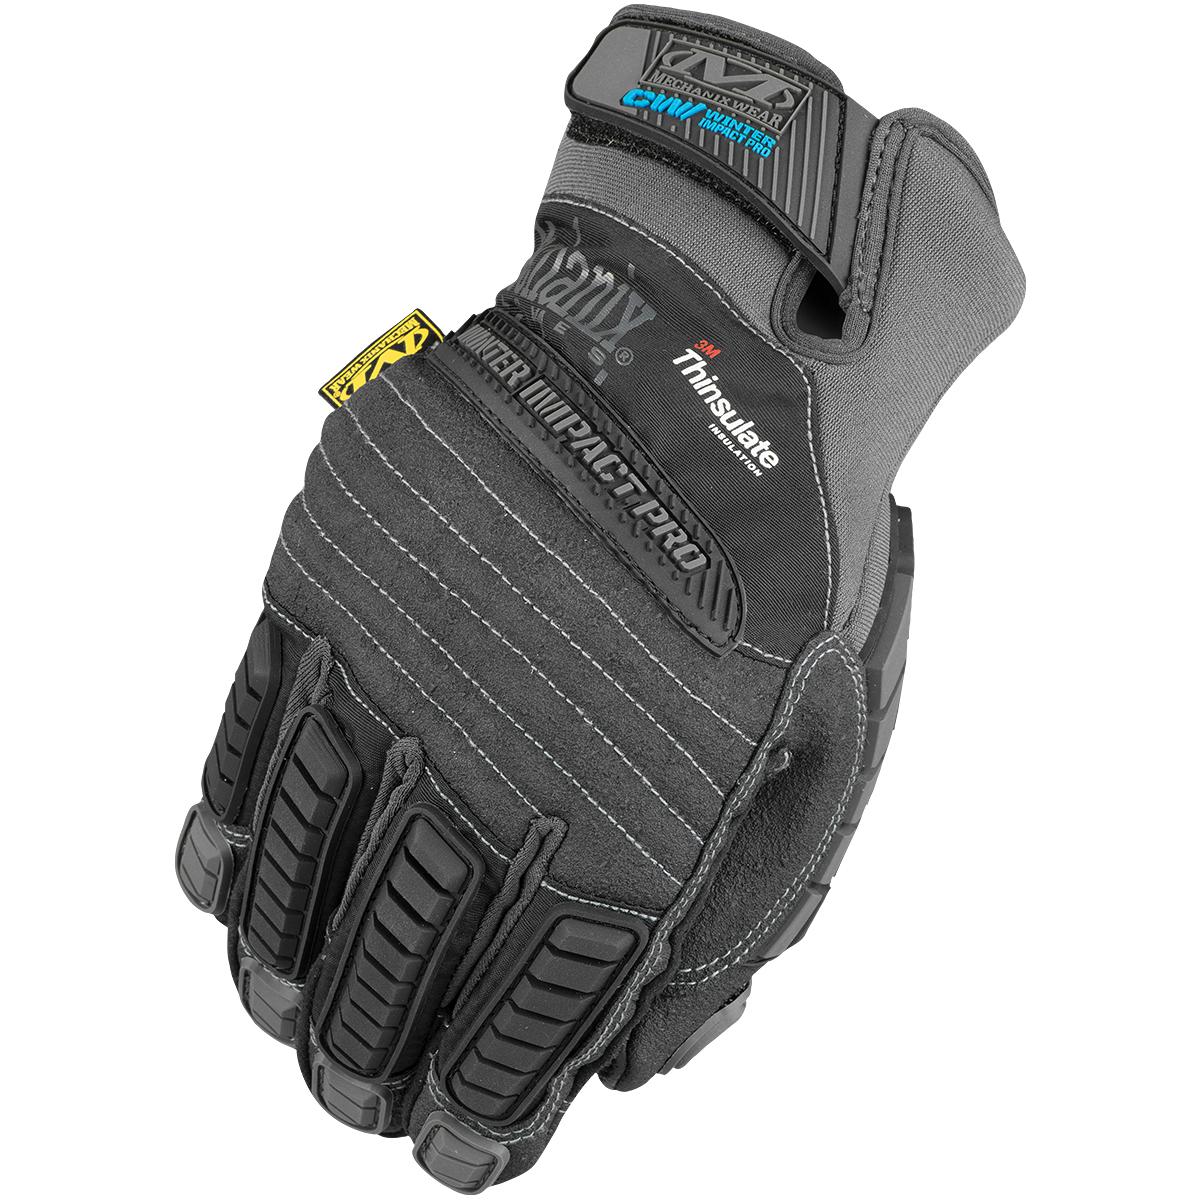 Mechanix Wear Winter Impact Pro Gloves Cold Weather Warm